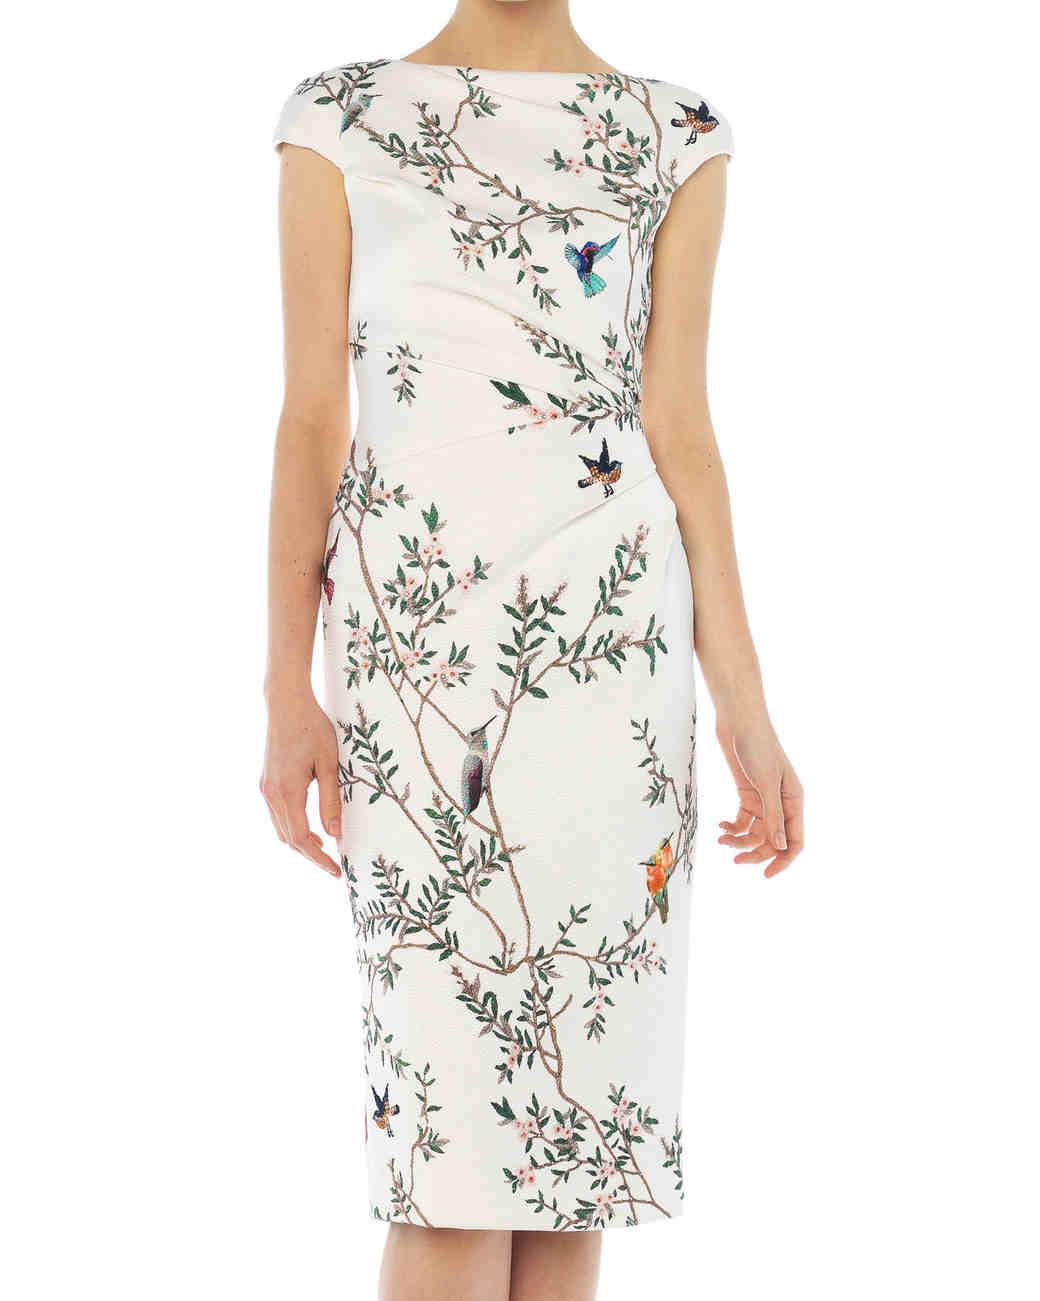 White Branch and Bird Print Dress